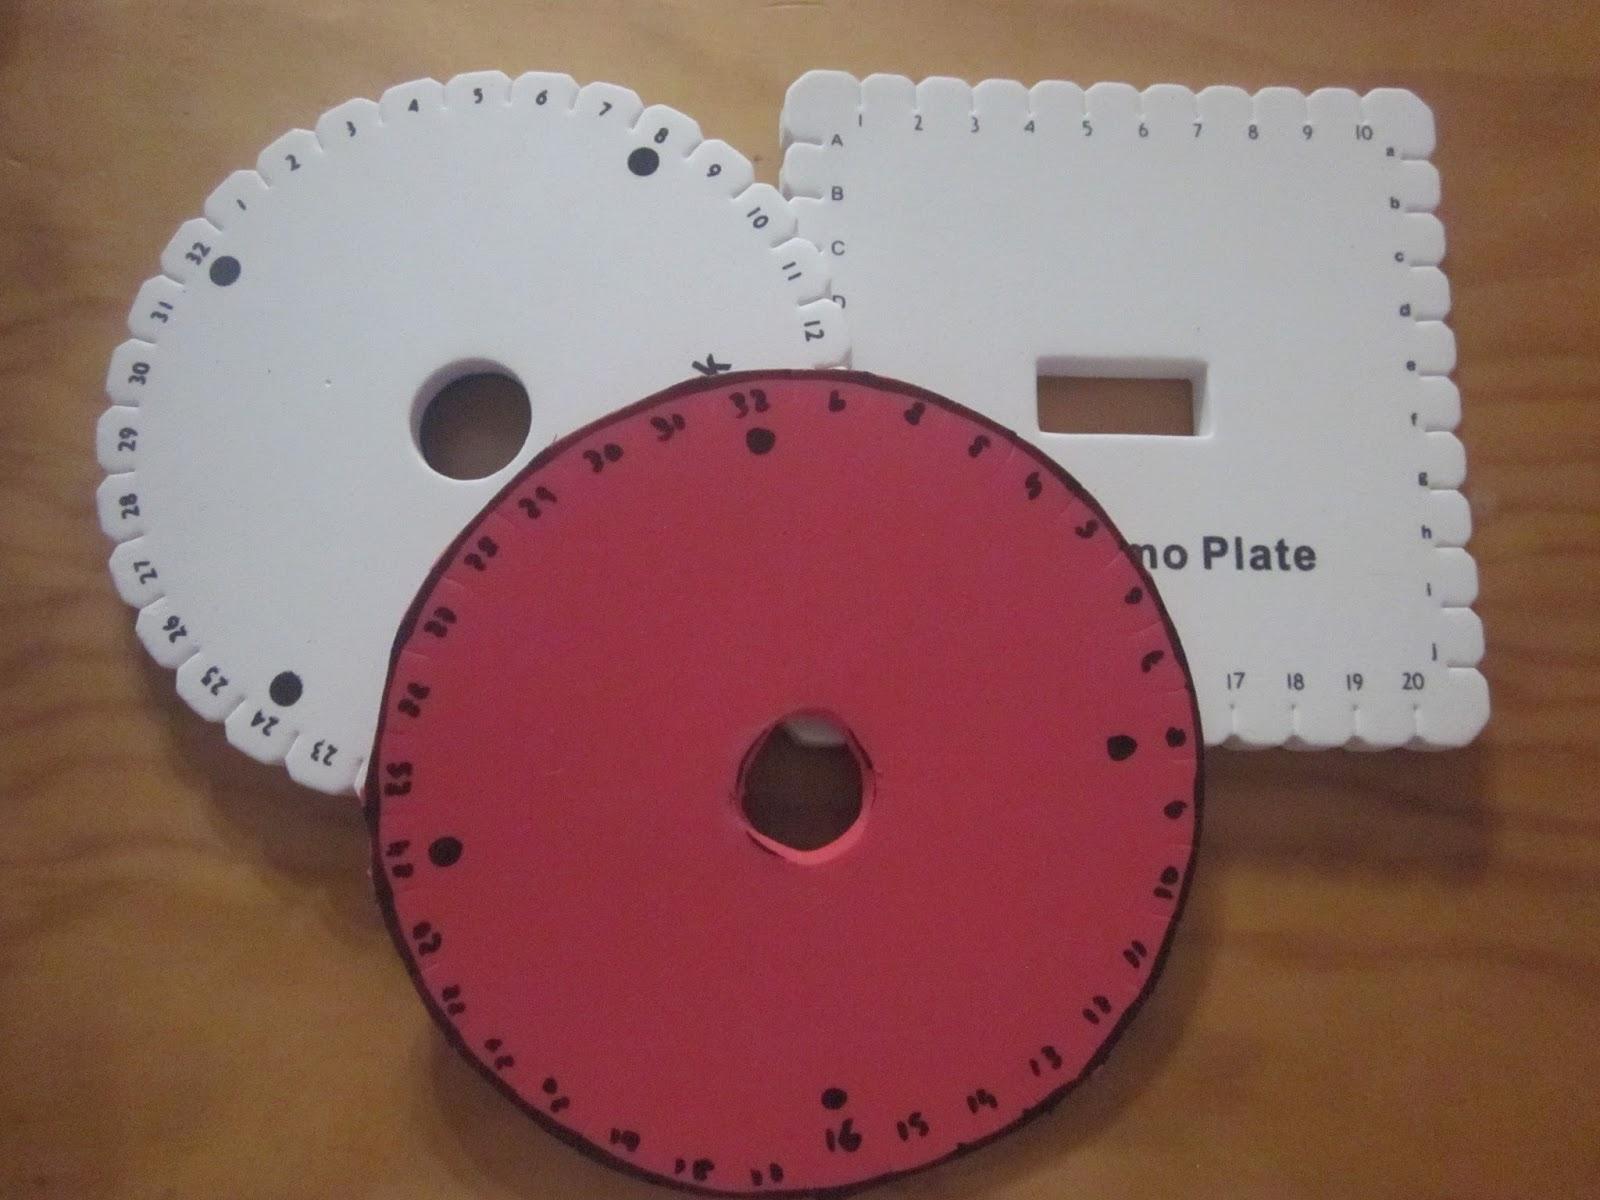 Decorate tu misma kuminihimo para regalar estas navidades - Manualidades con discos ...